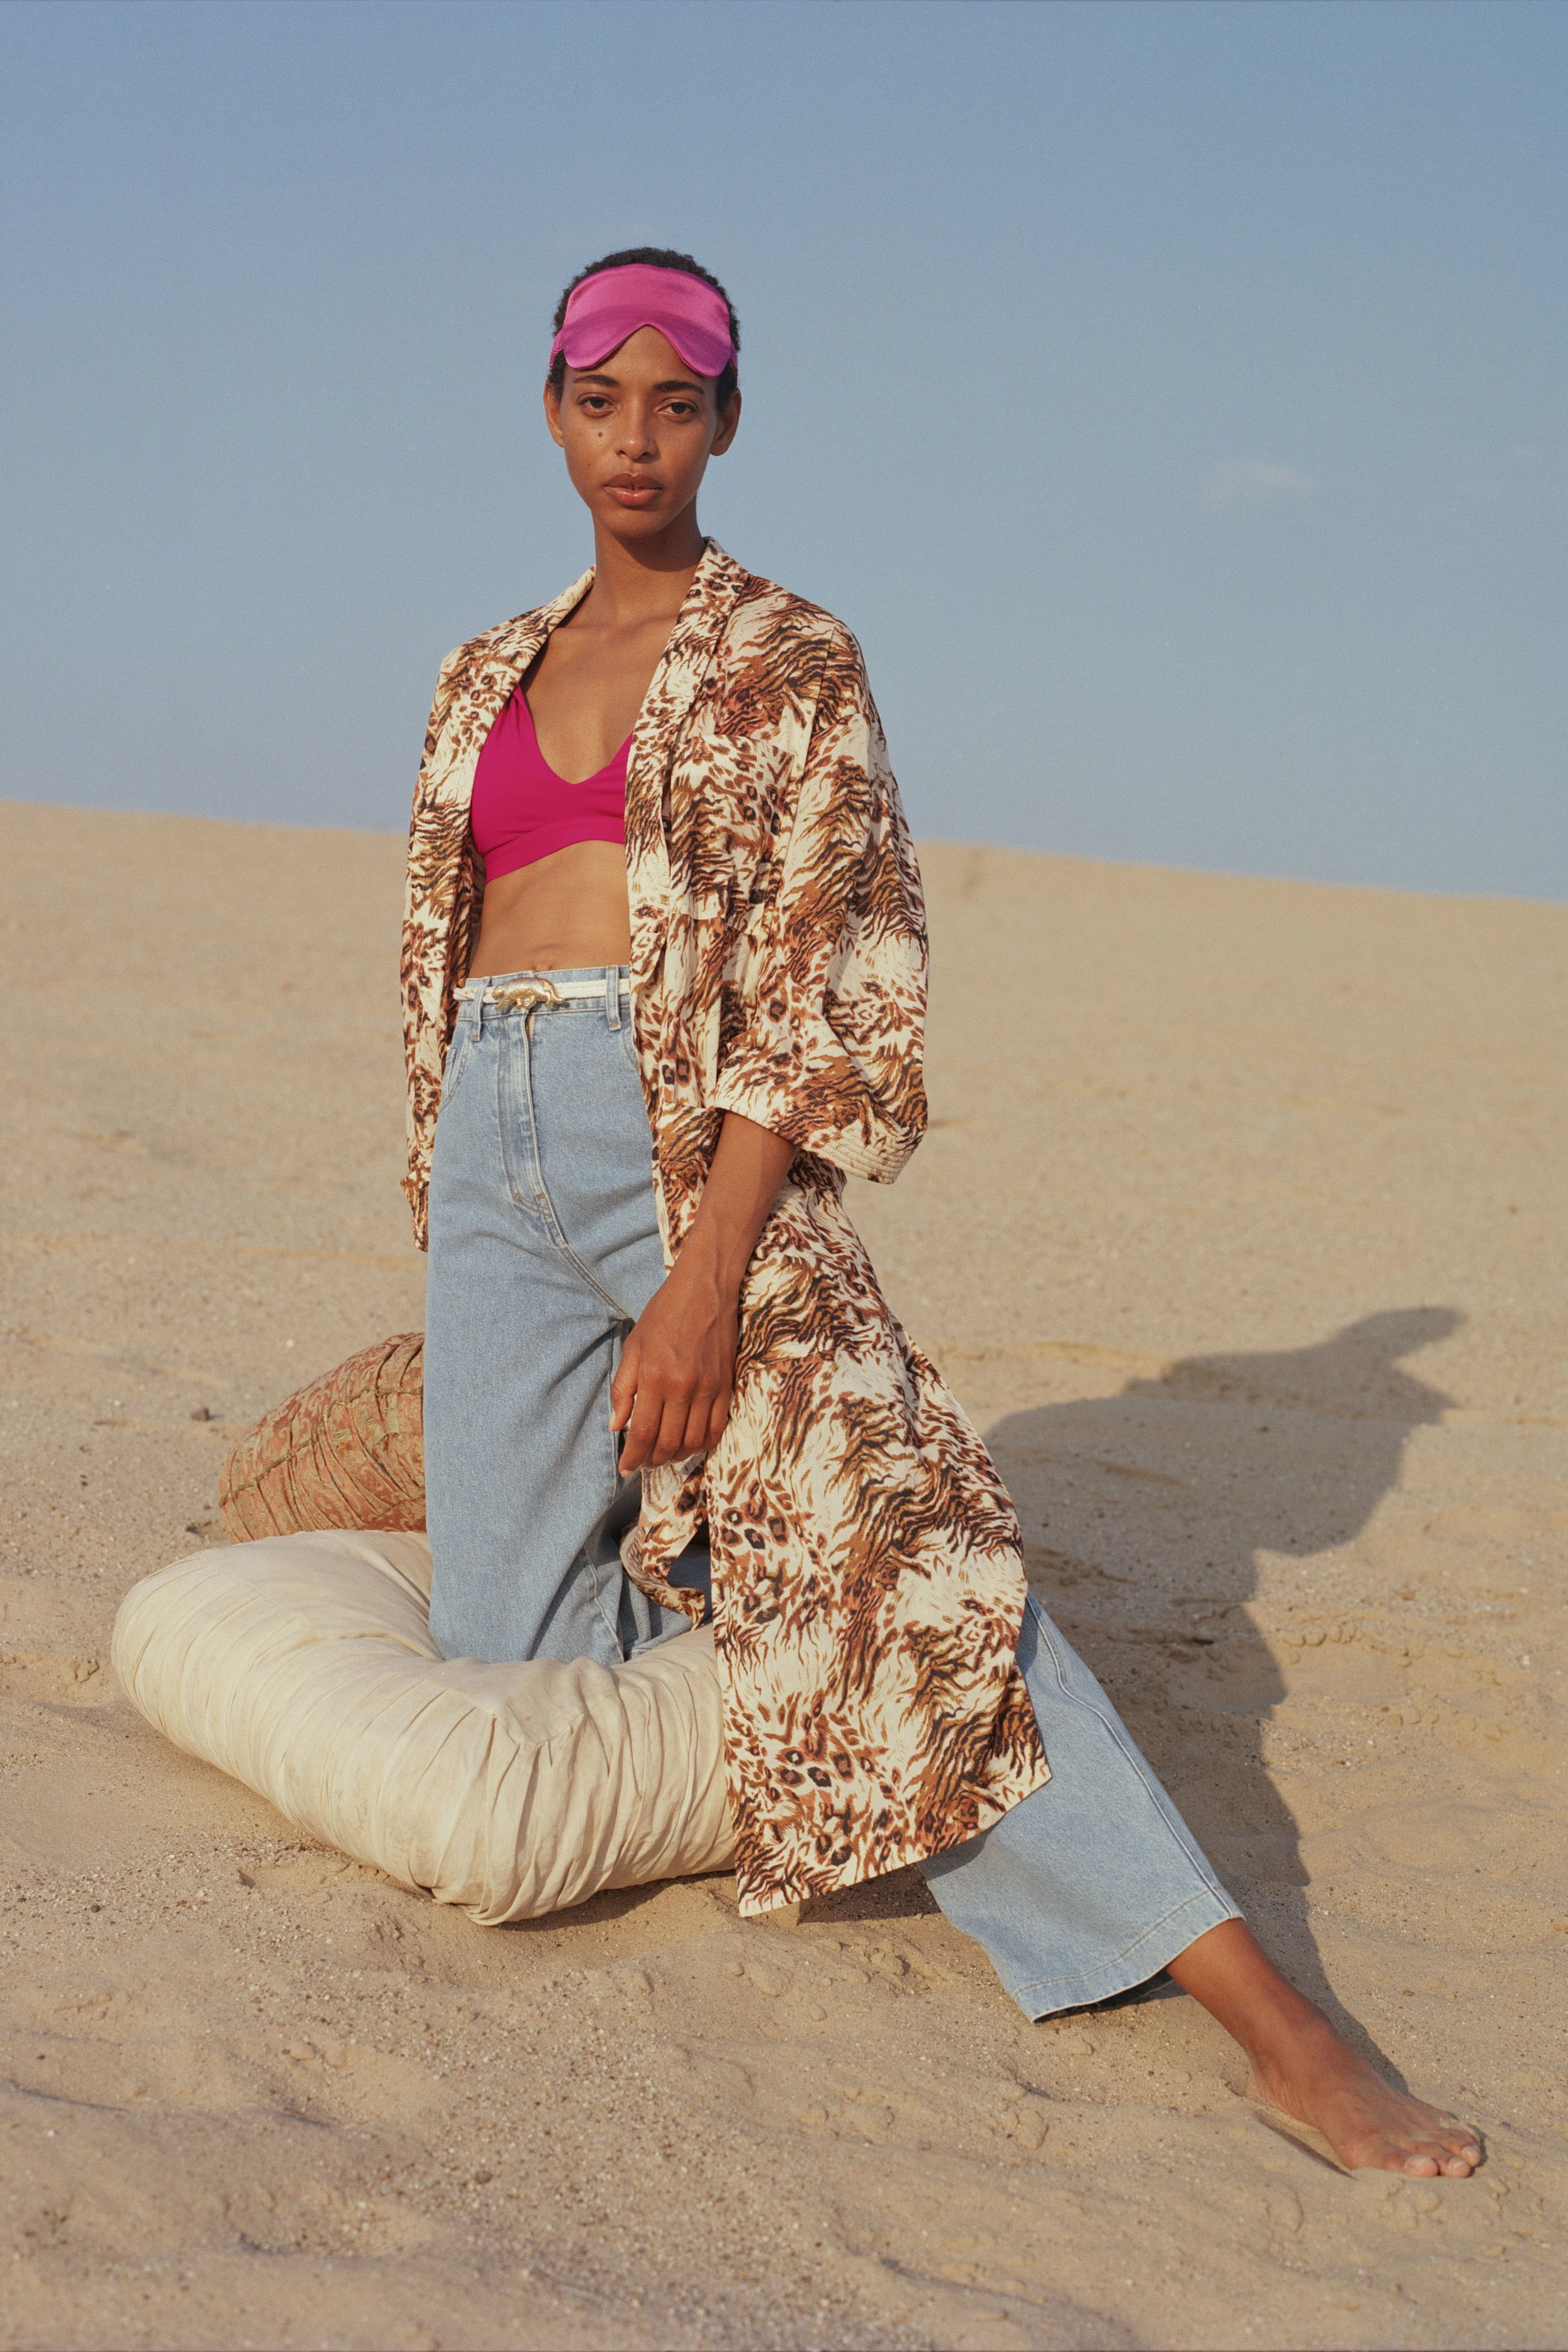 Breeze bikini top, rosebud    €160  Kimo robe, animal douvet    €395  Marfa jeans, 80's wash    €290